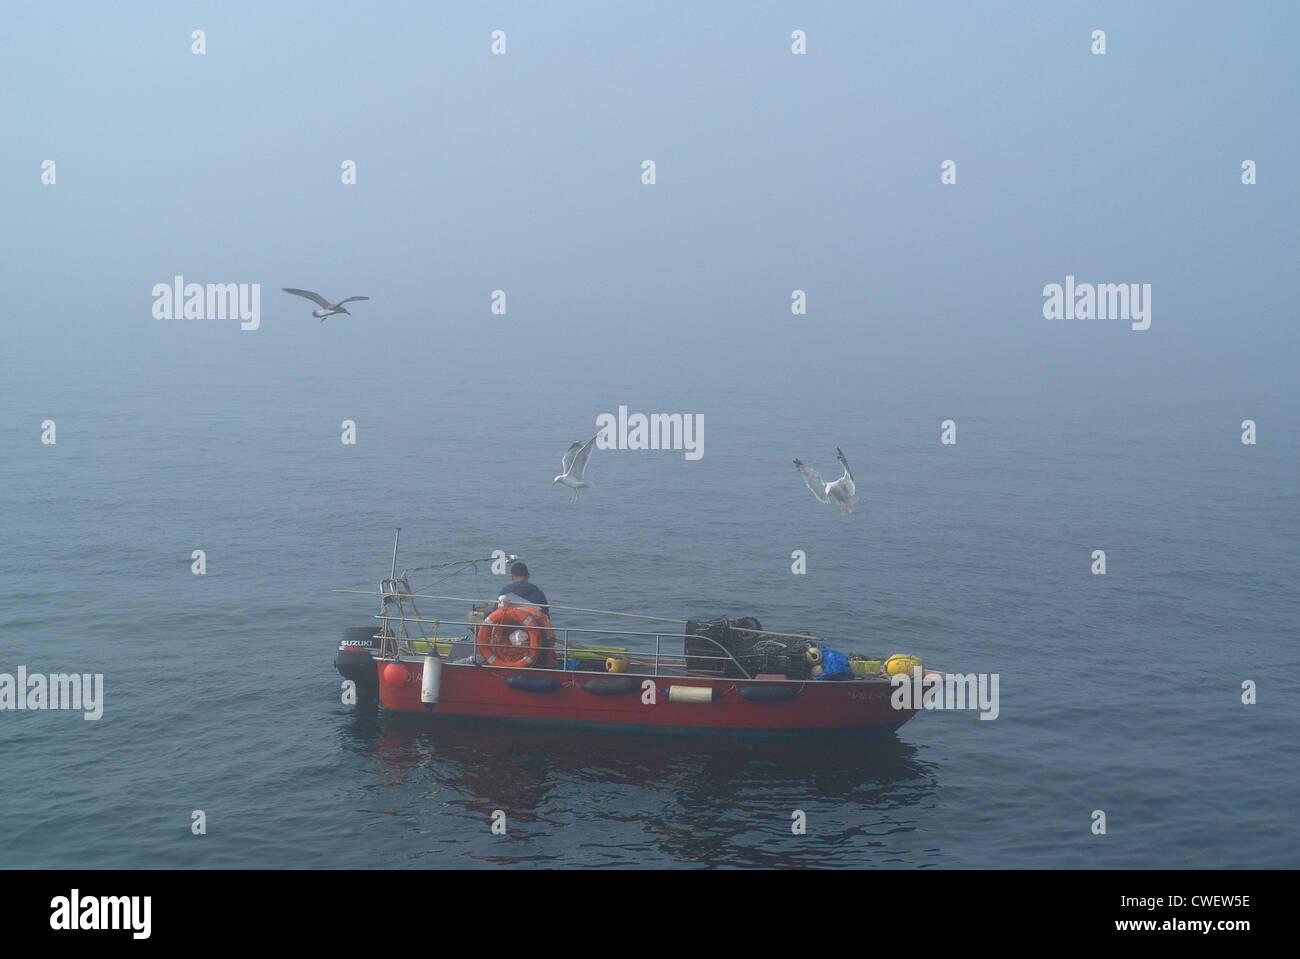 Artisan fisherman working in the mist - Stock Image